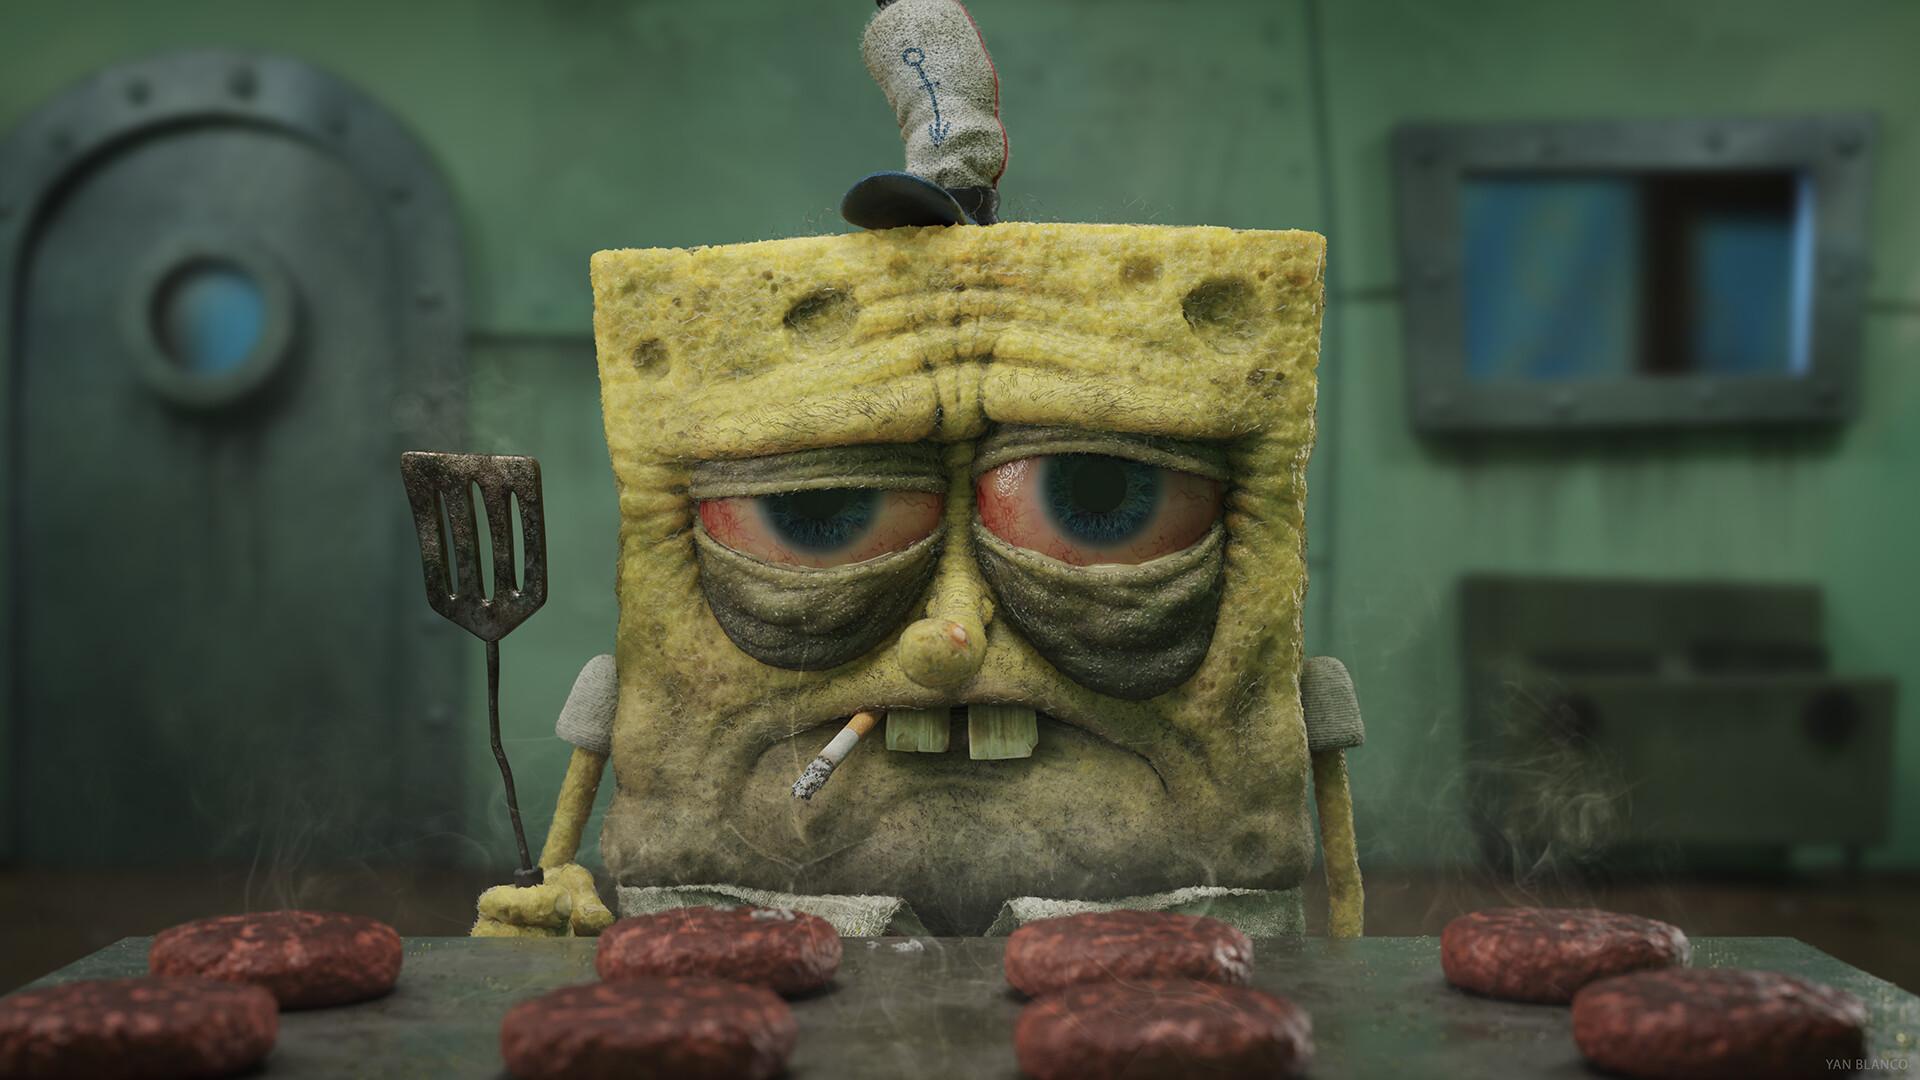 General 1920x1080 Yan Blanco spongebob cigarettes fast food hamburgers stove digital art